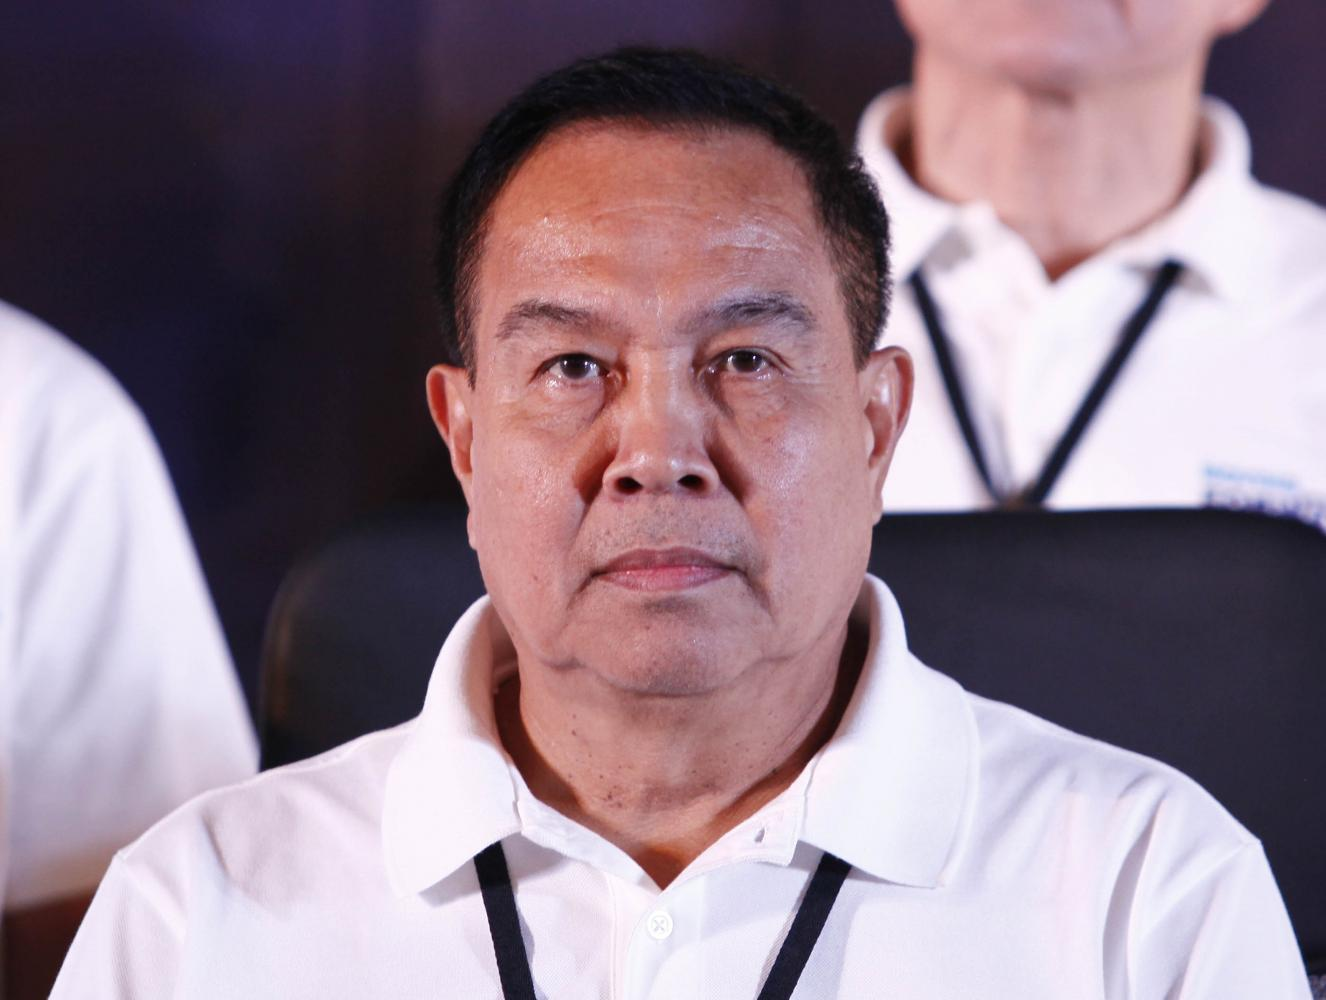 FAT president Somyot Poompunmuang Pattarapong Chatpattarasill